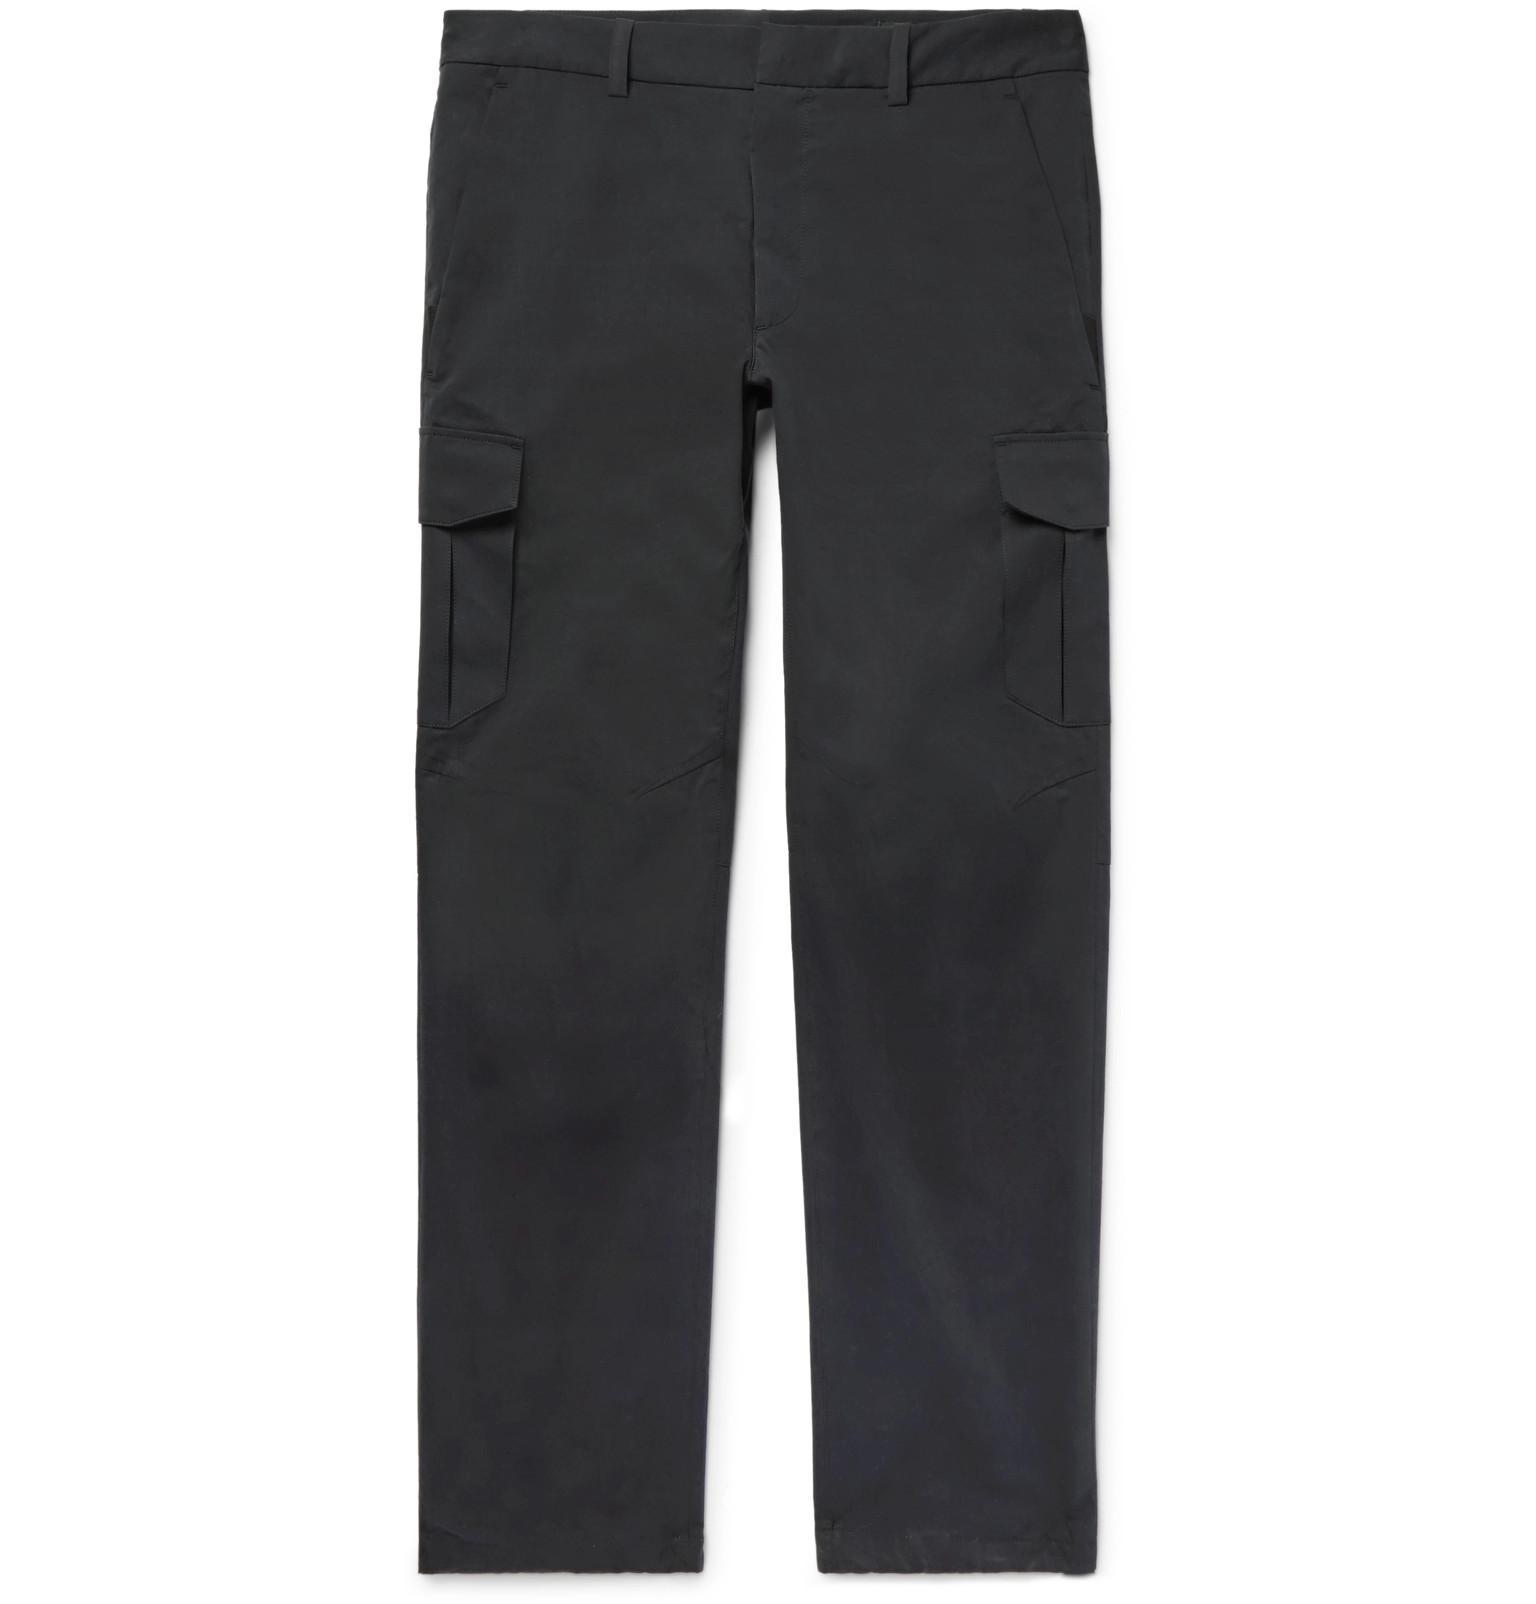 Jay Cotton-blend Cargo Trousers Rag & Bone i7Nj9gmLIJ